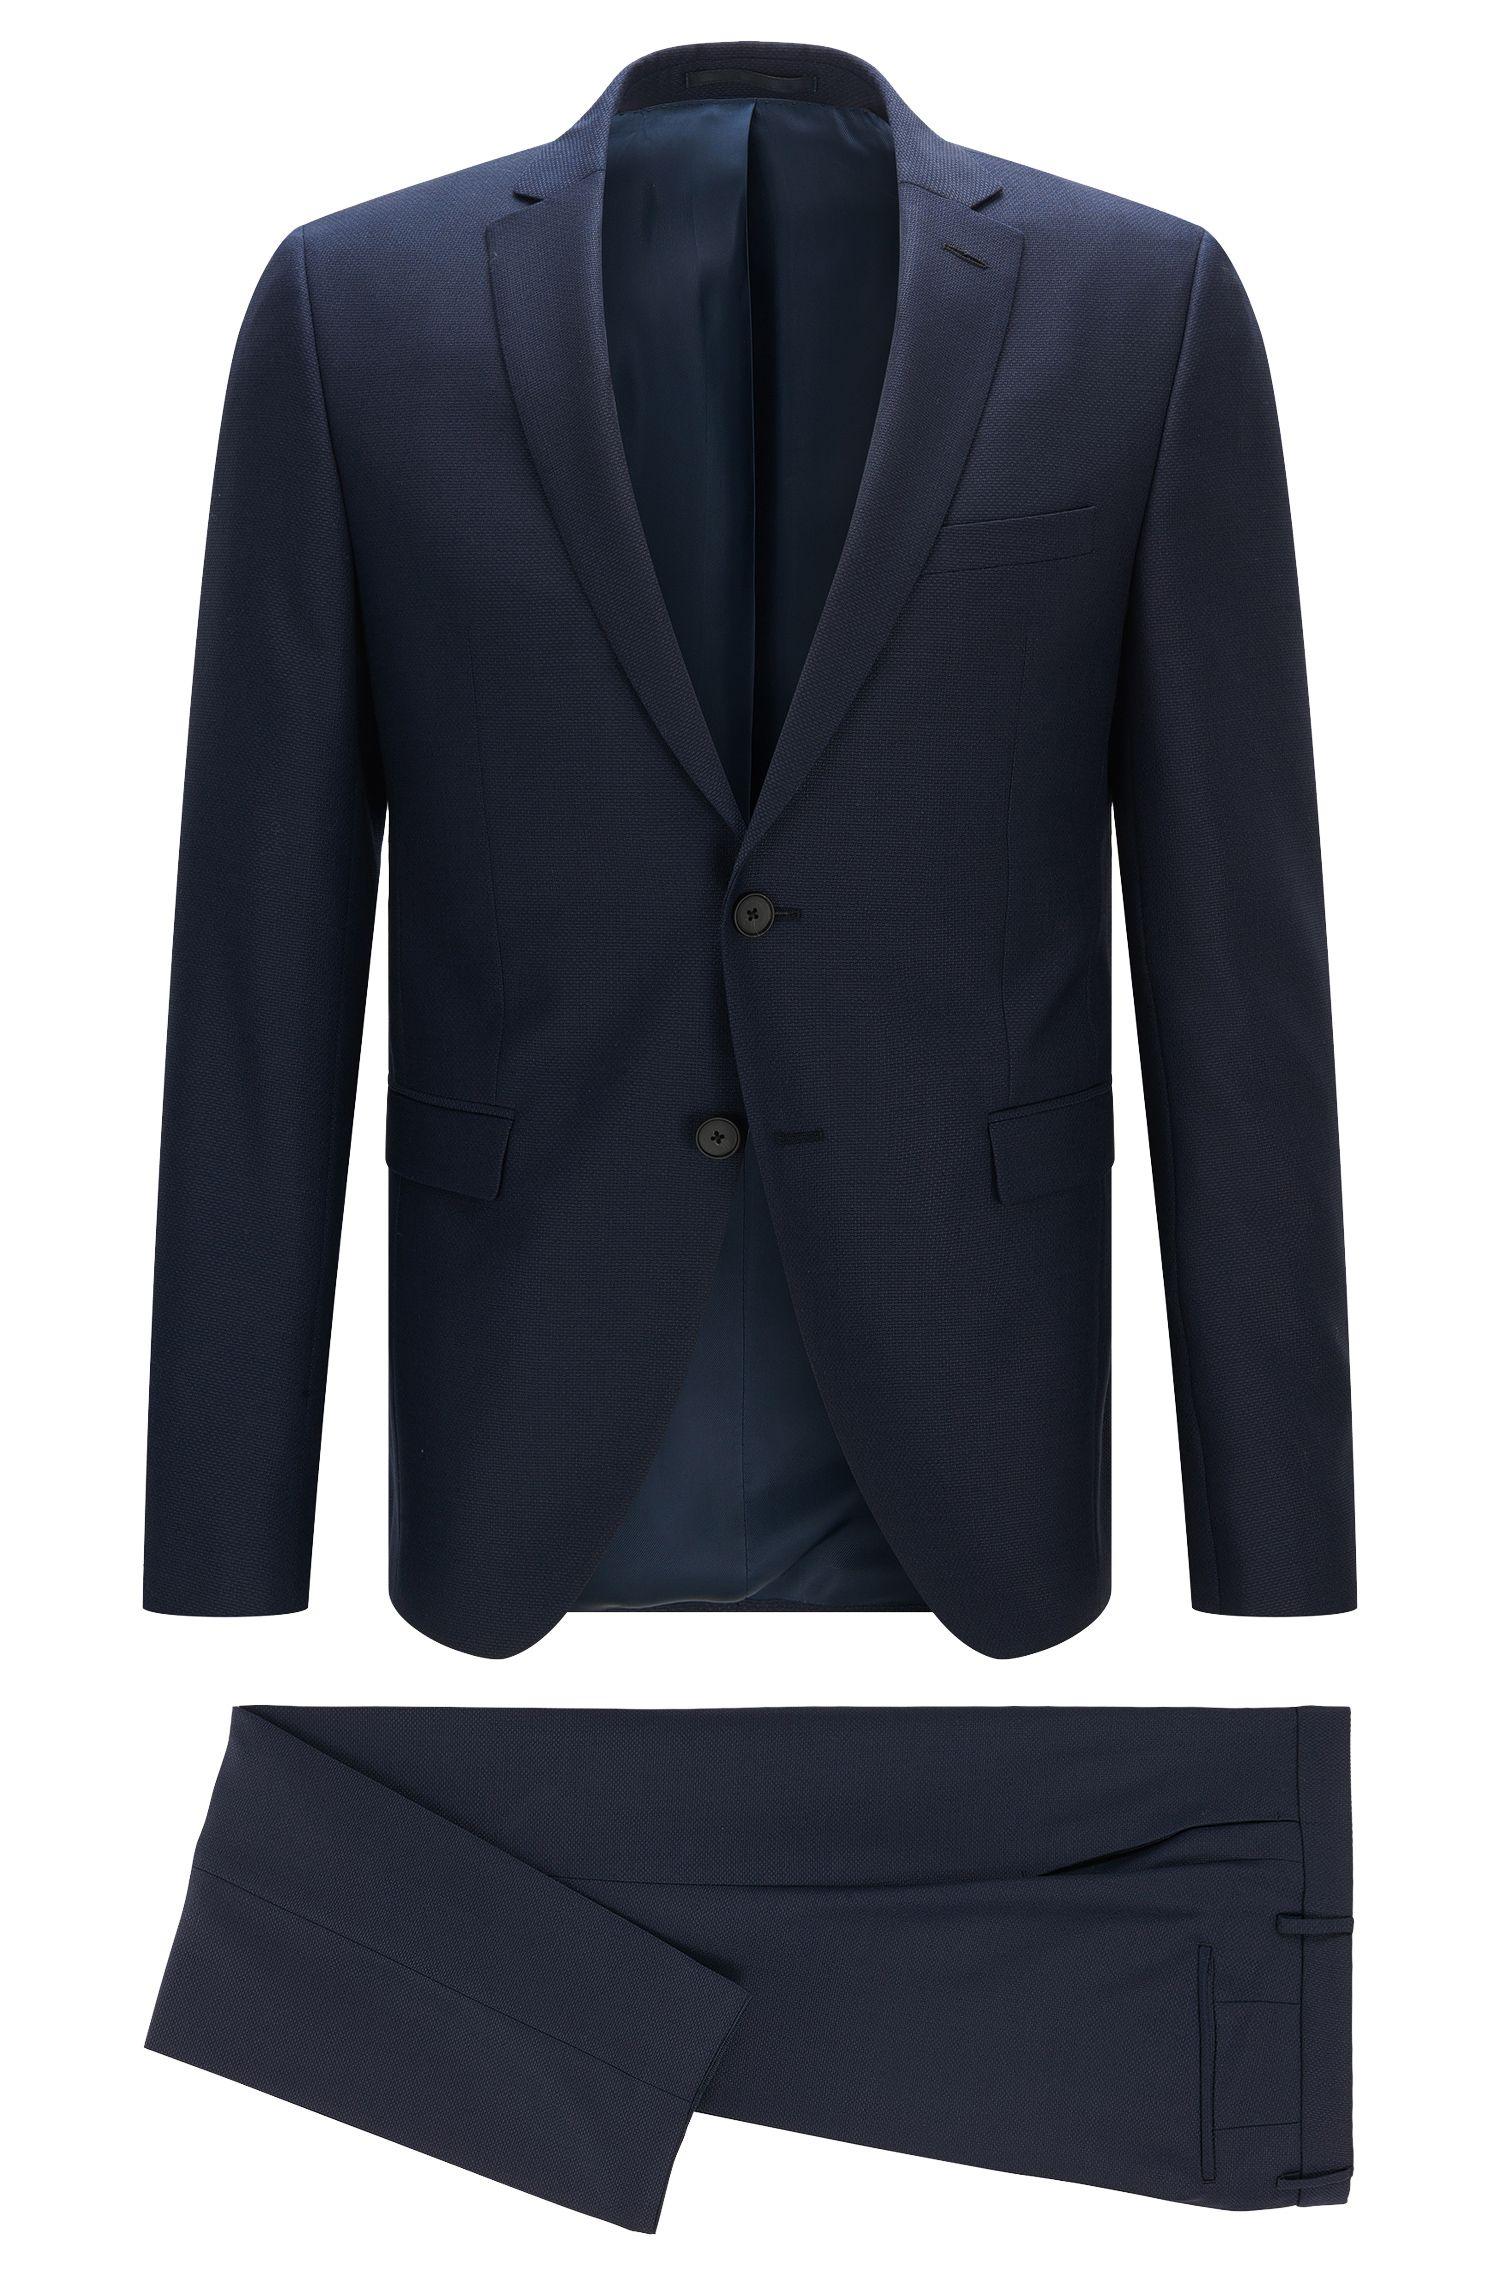 Extra Slim-Fit Anzug aus strukturiertem Schurwoll-Mix